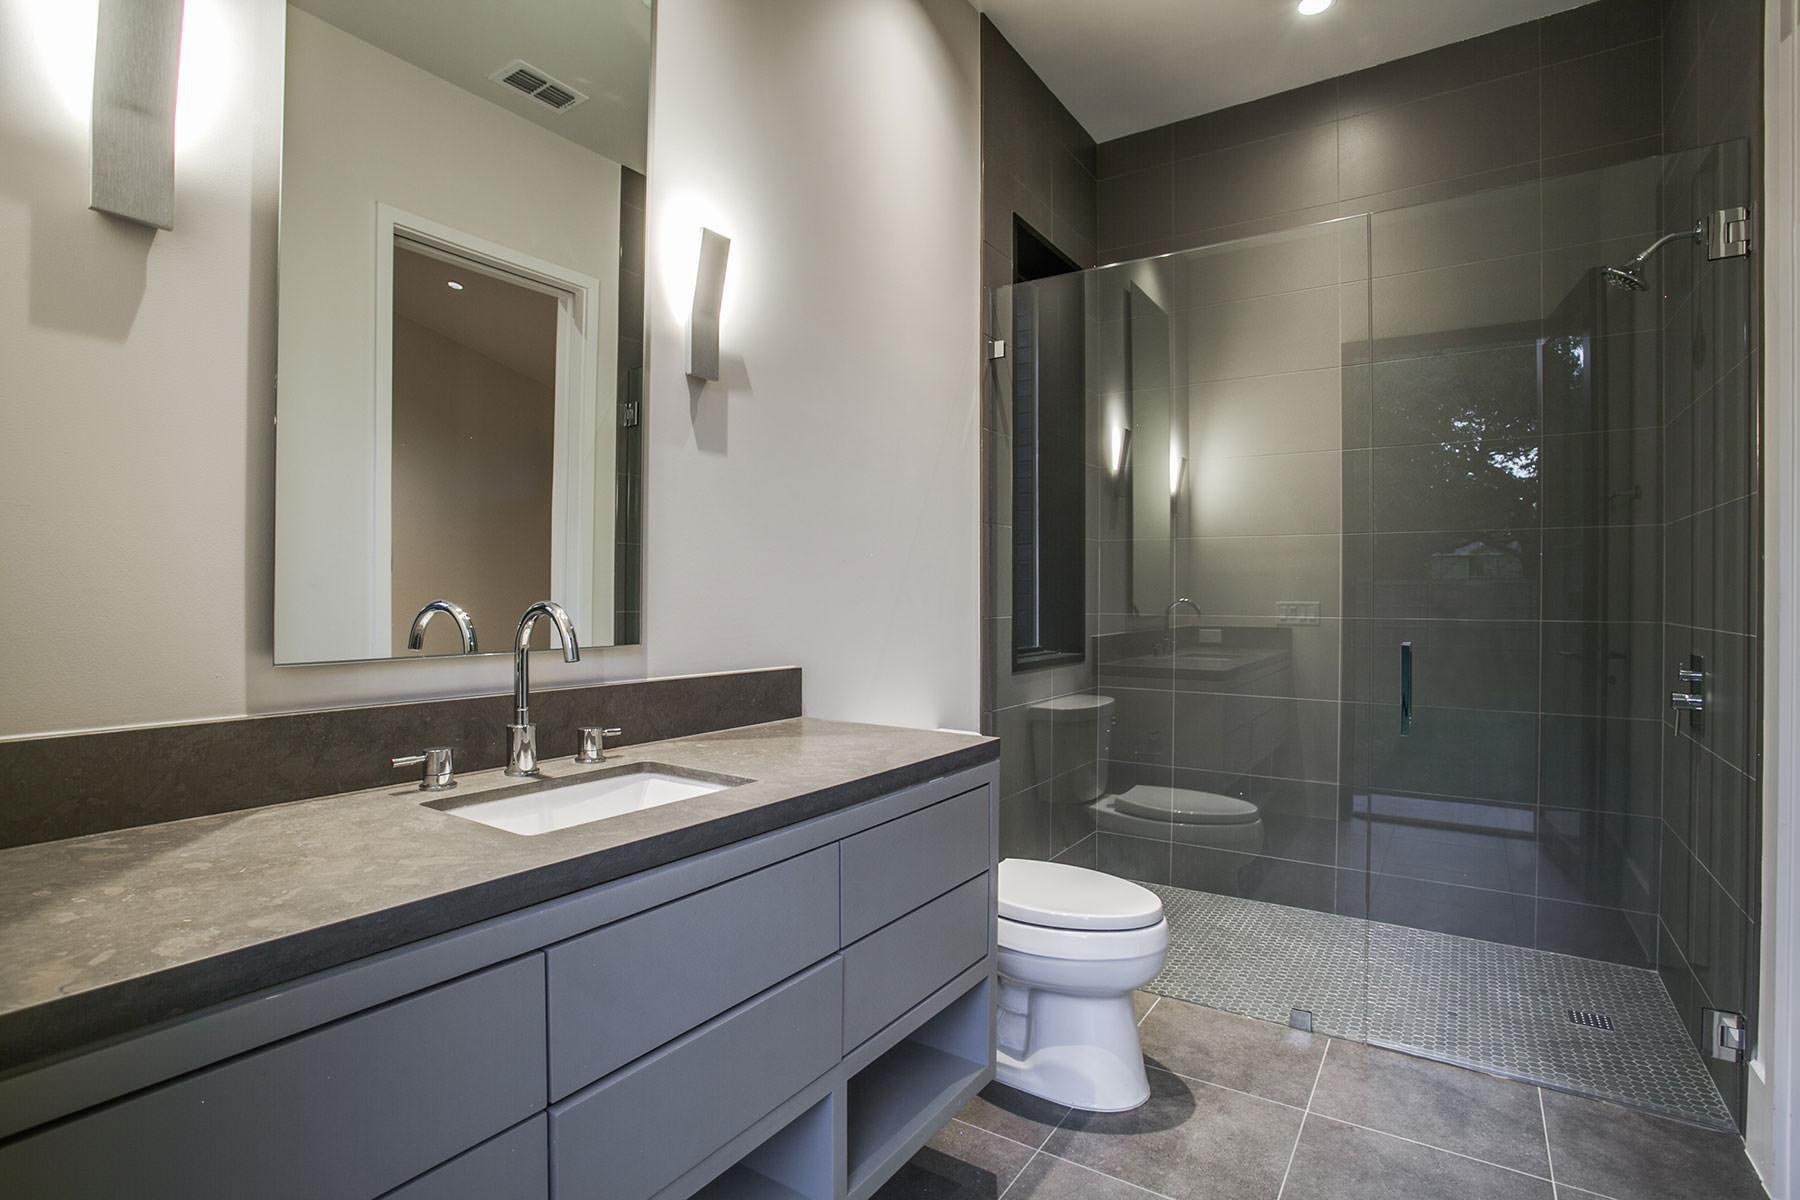 26-up-bath